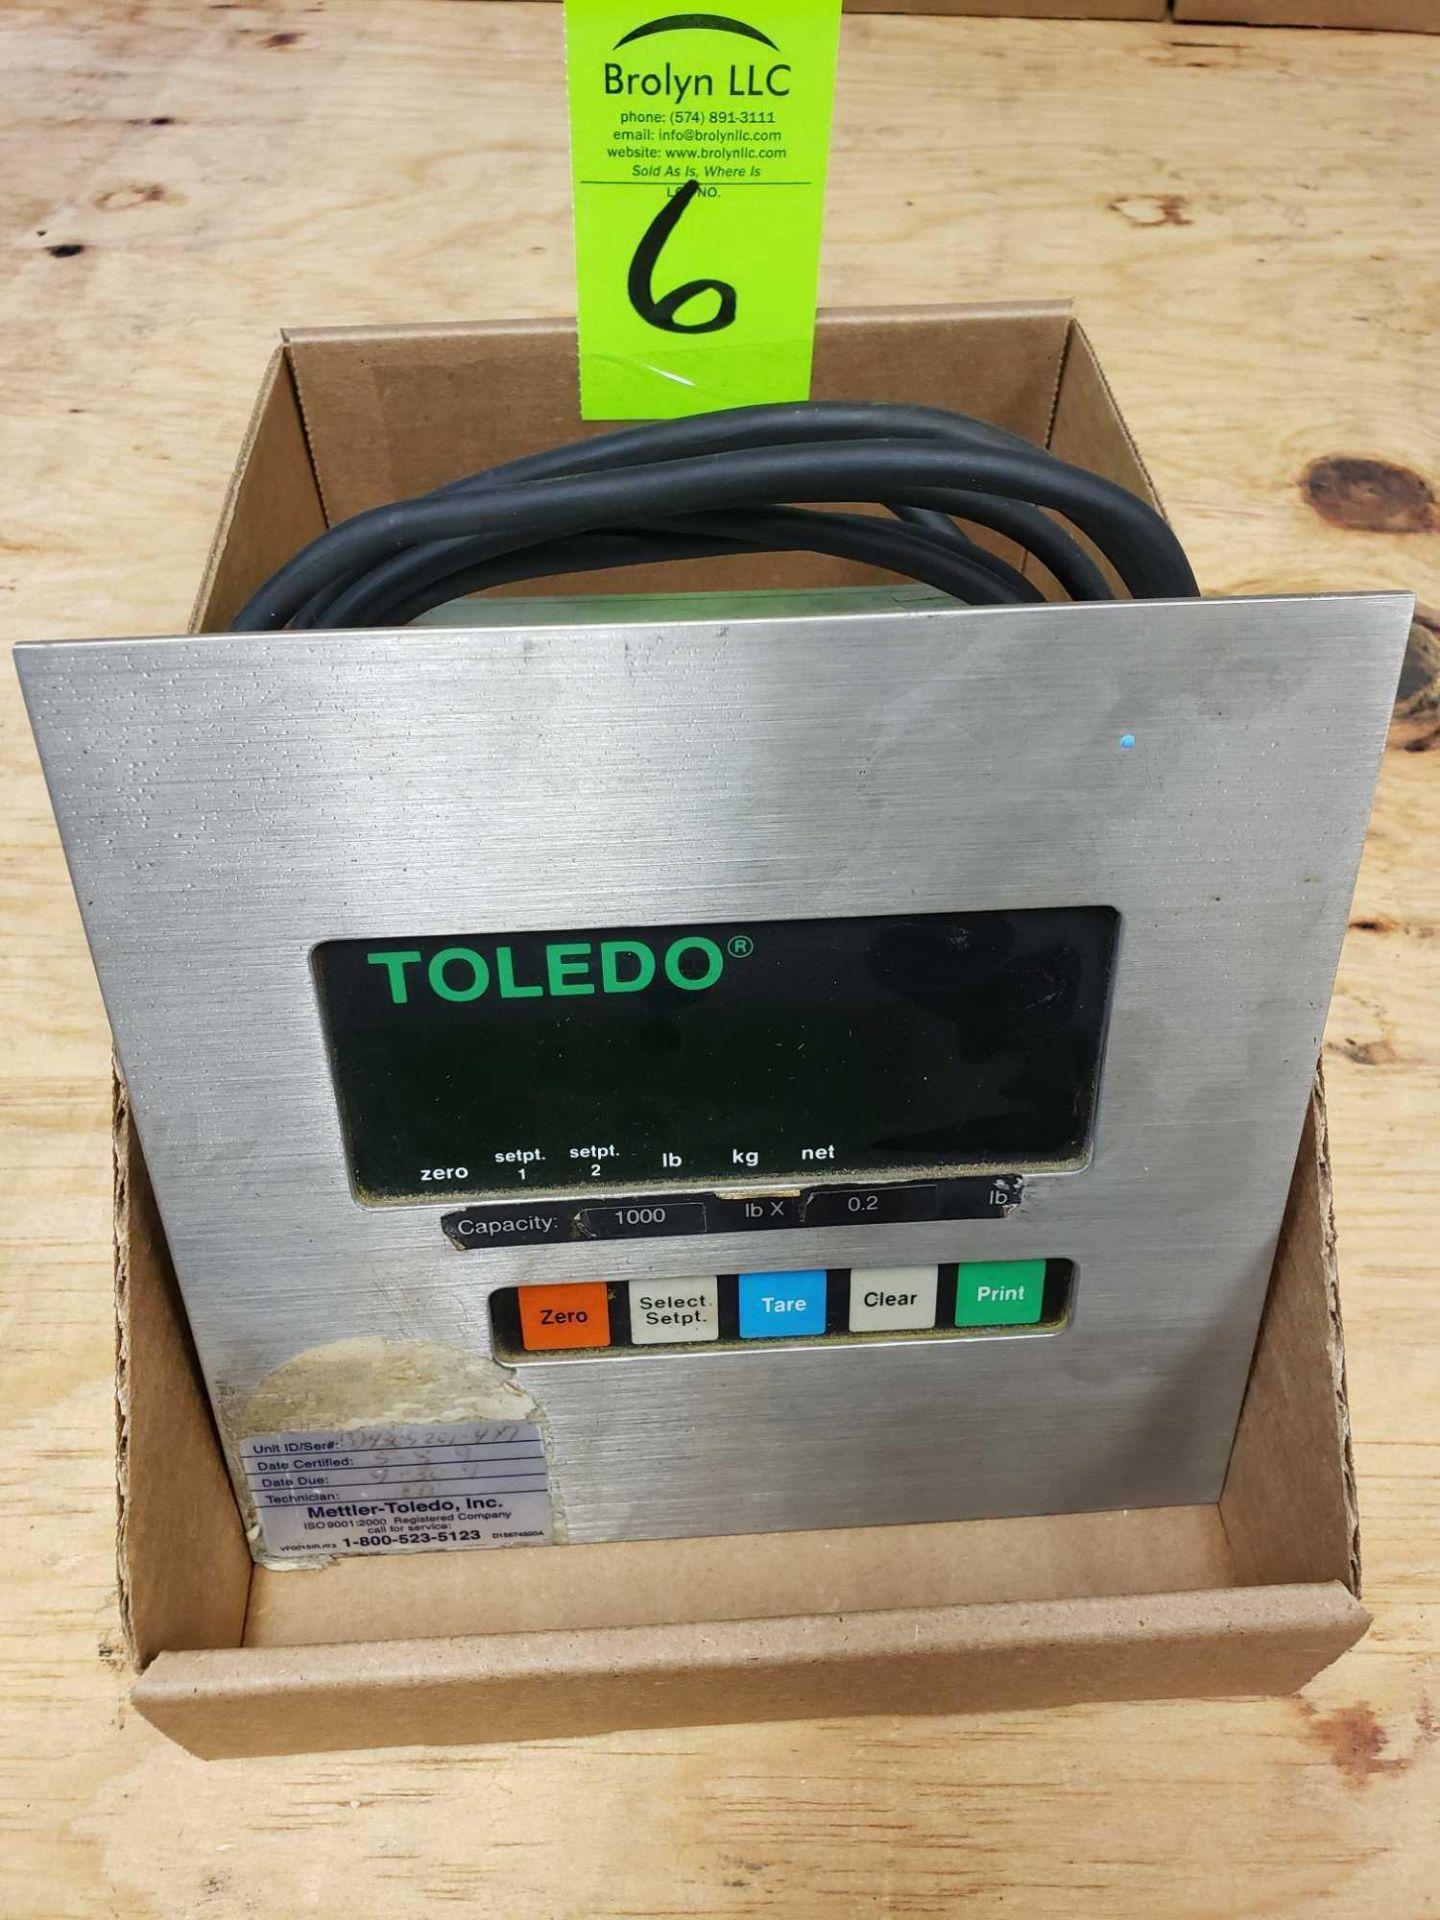 Lot 6 - Toledo scale display model 8510.